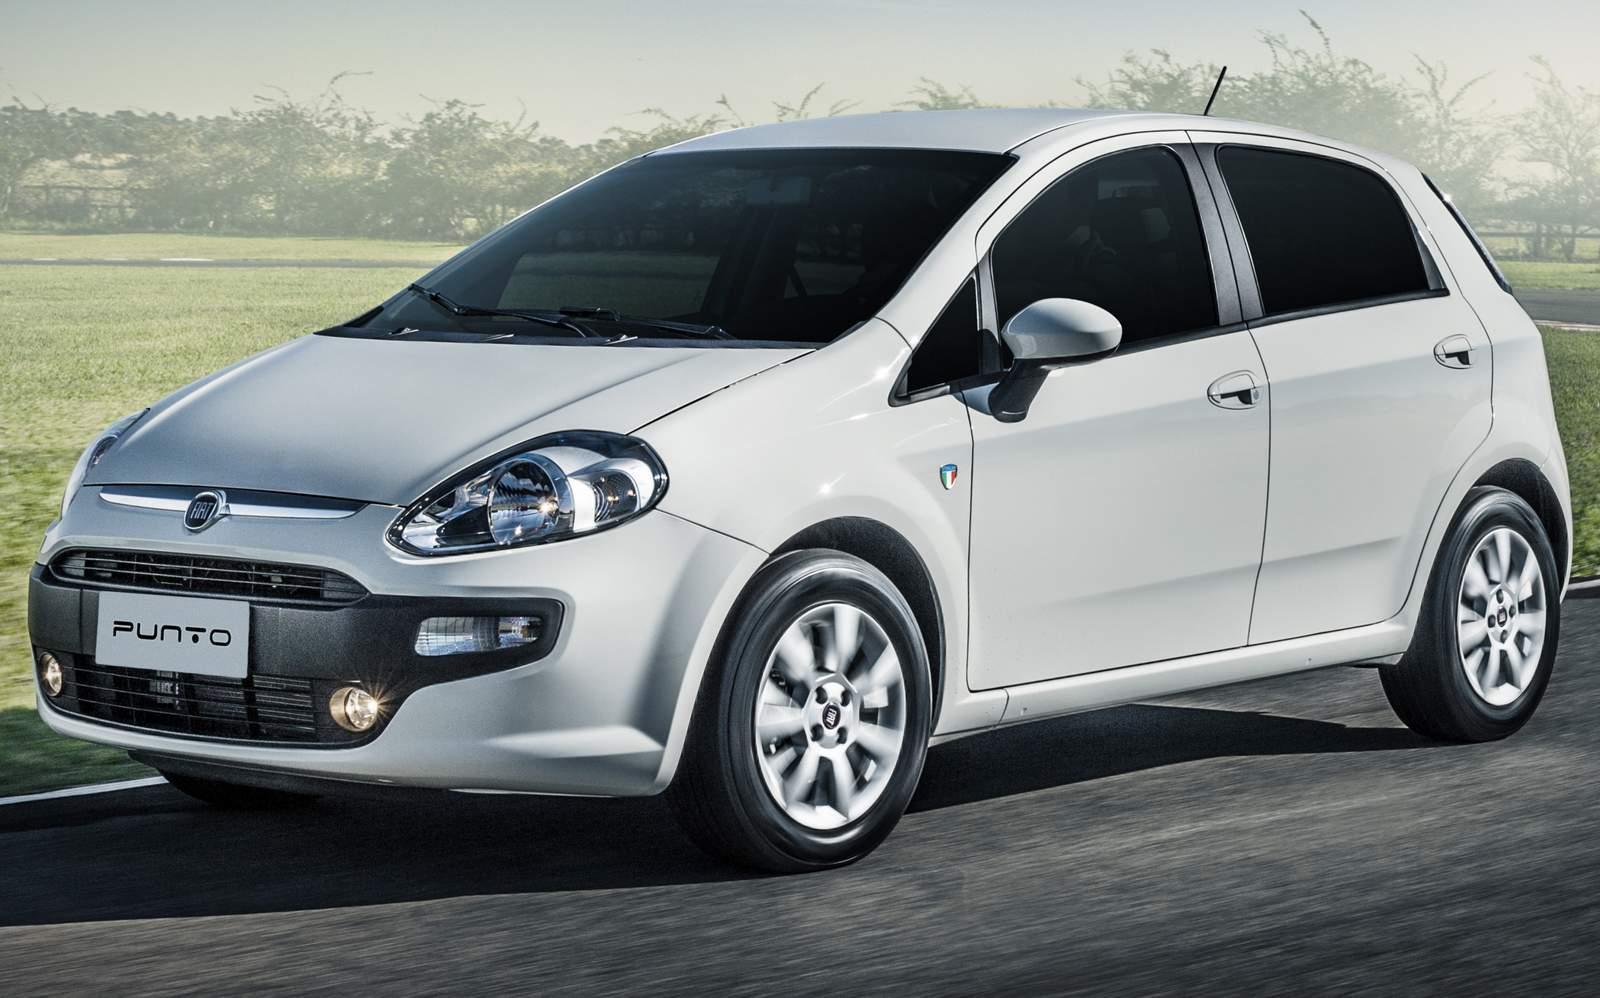 novo-Fiat-Punto-2016